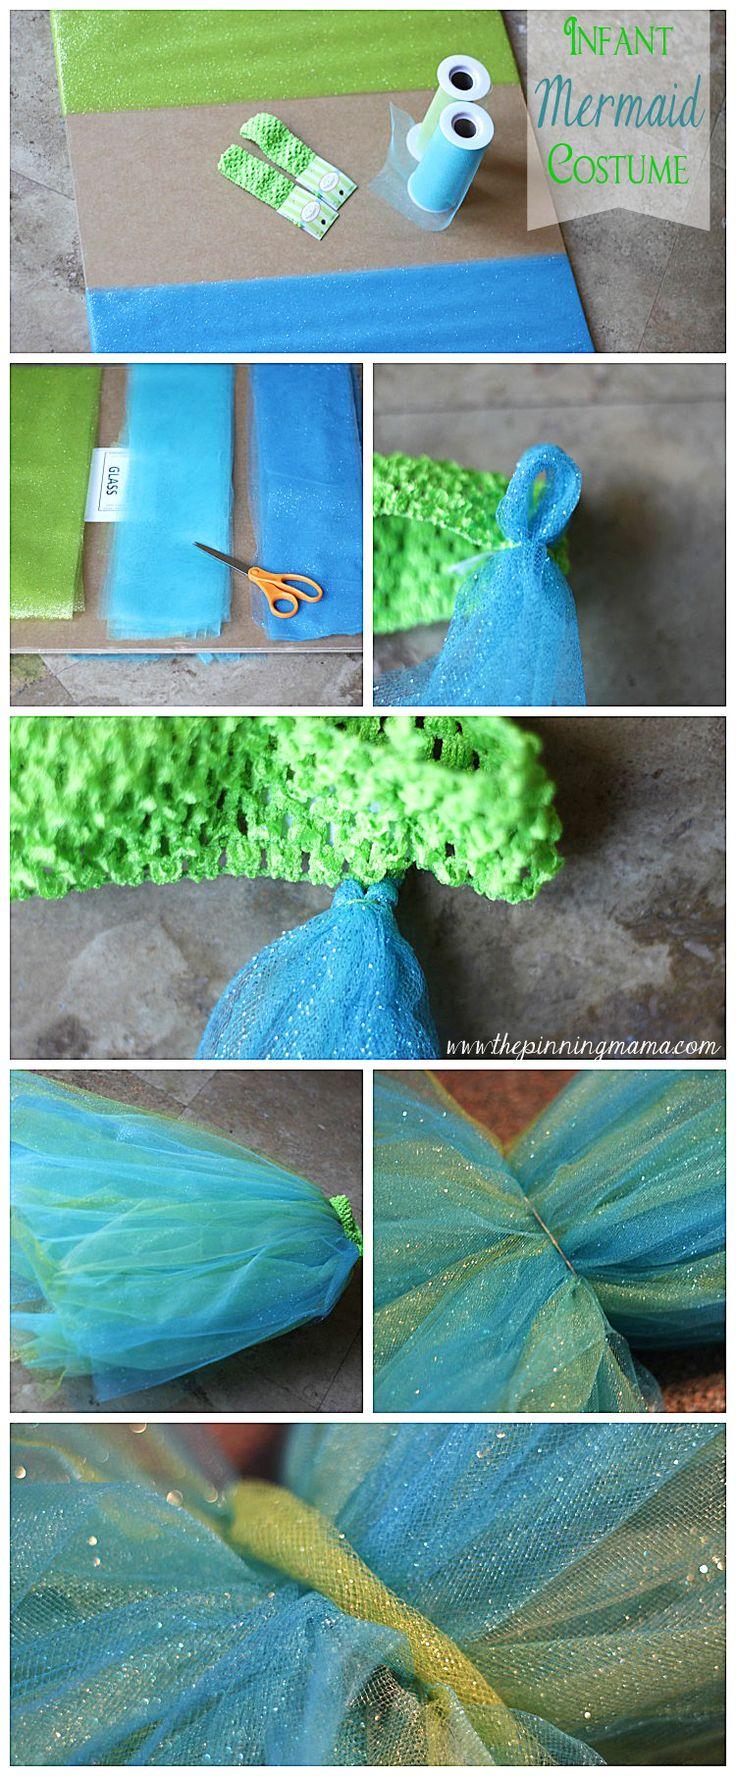 DIY Infant Mermaid Halloween Costume | The Pinning Mama